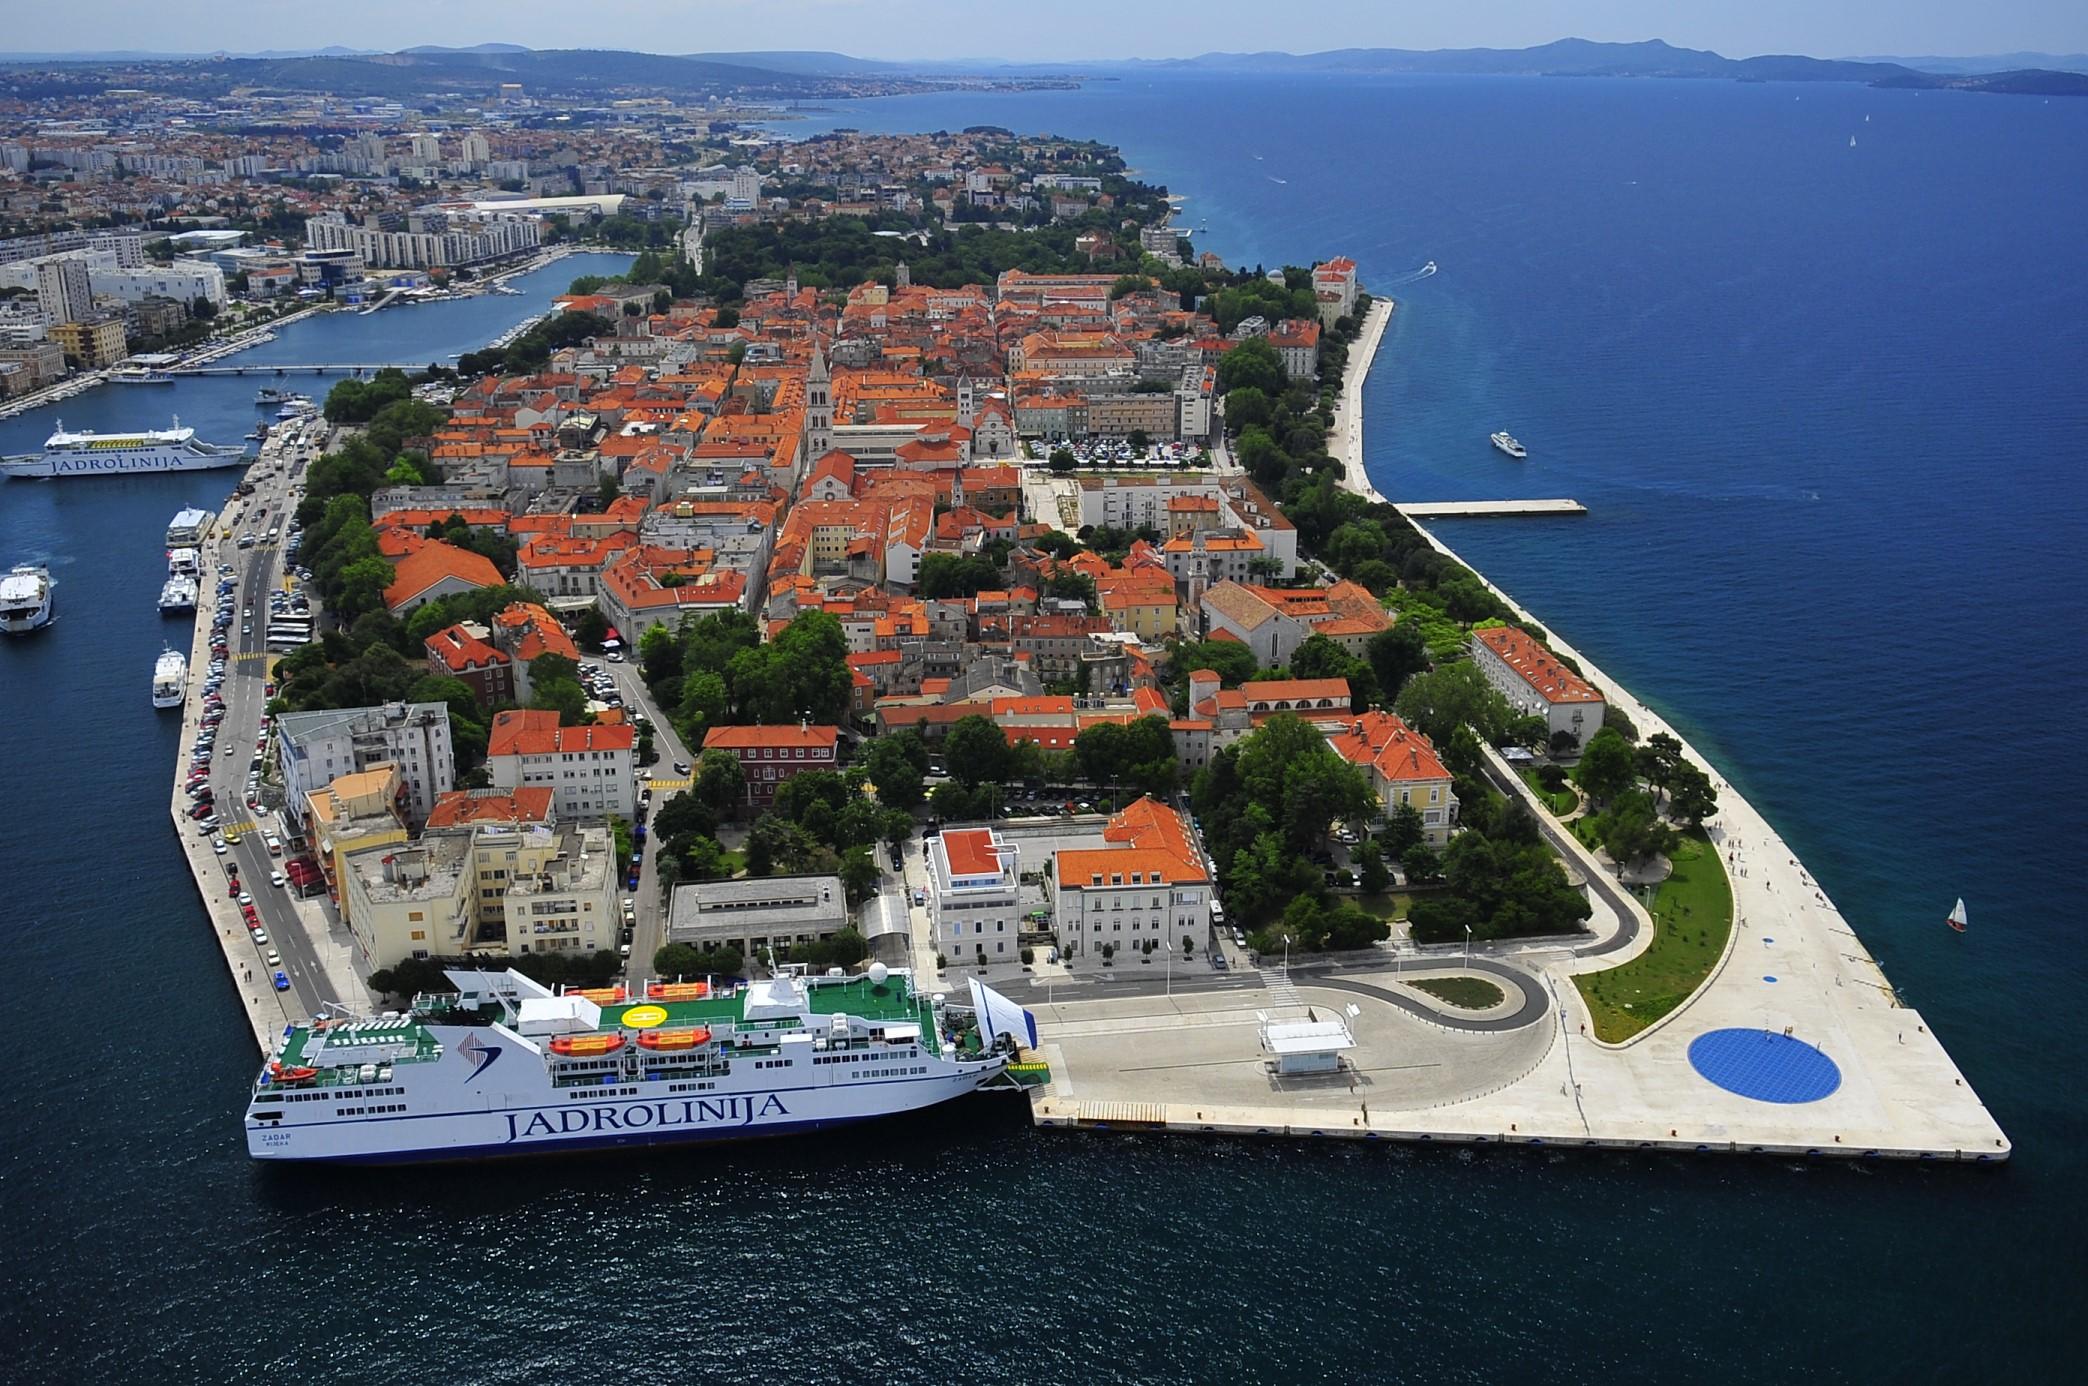 Zadar, Croatia - Monterrasol private tours to Zadar, Croatia. Travel agency offers custom private car tours to see Zadar in Croatia. Order custom private tour to Zadar with departure date on request.